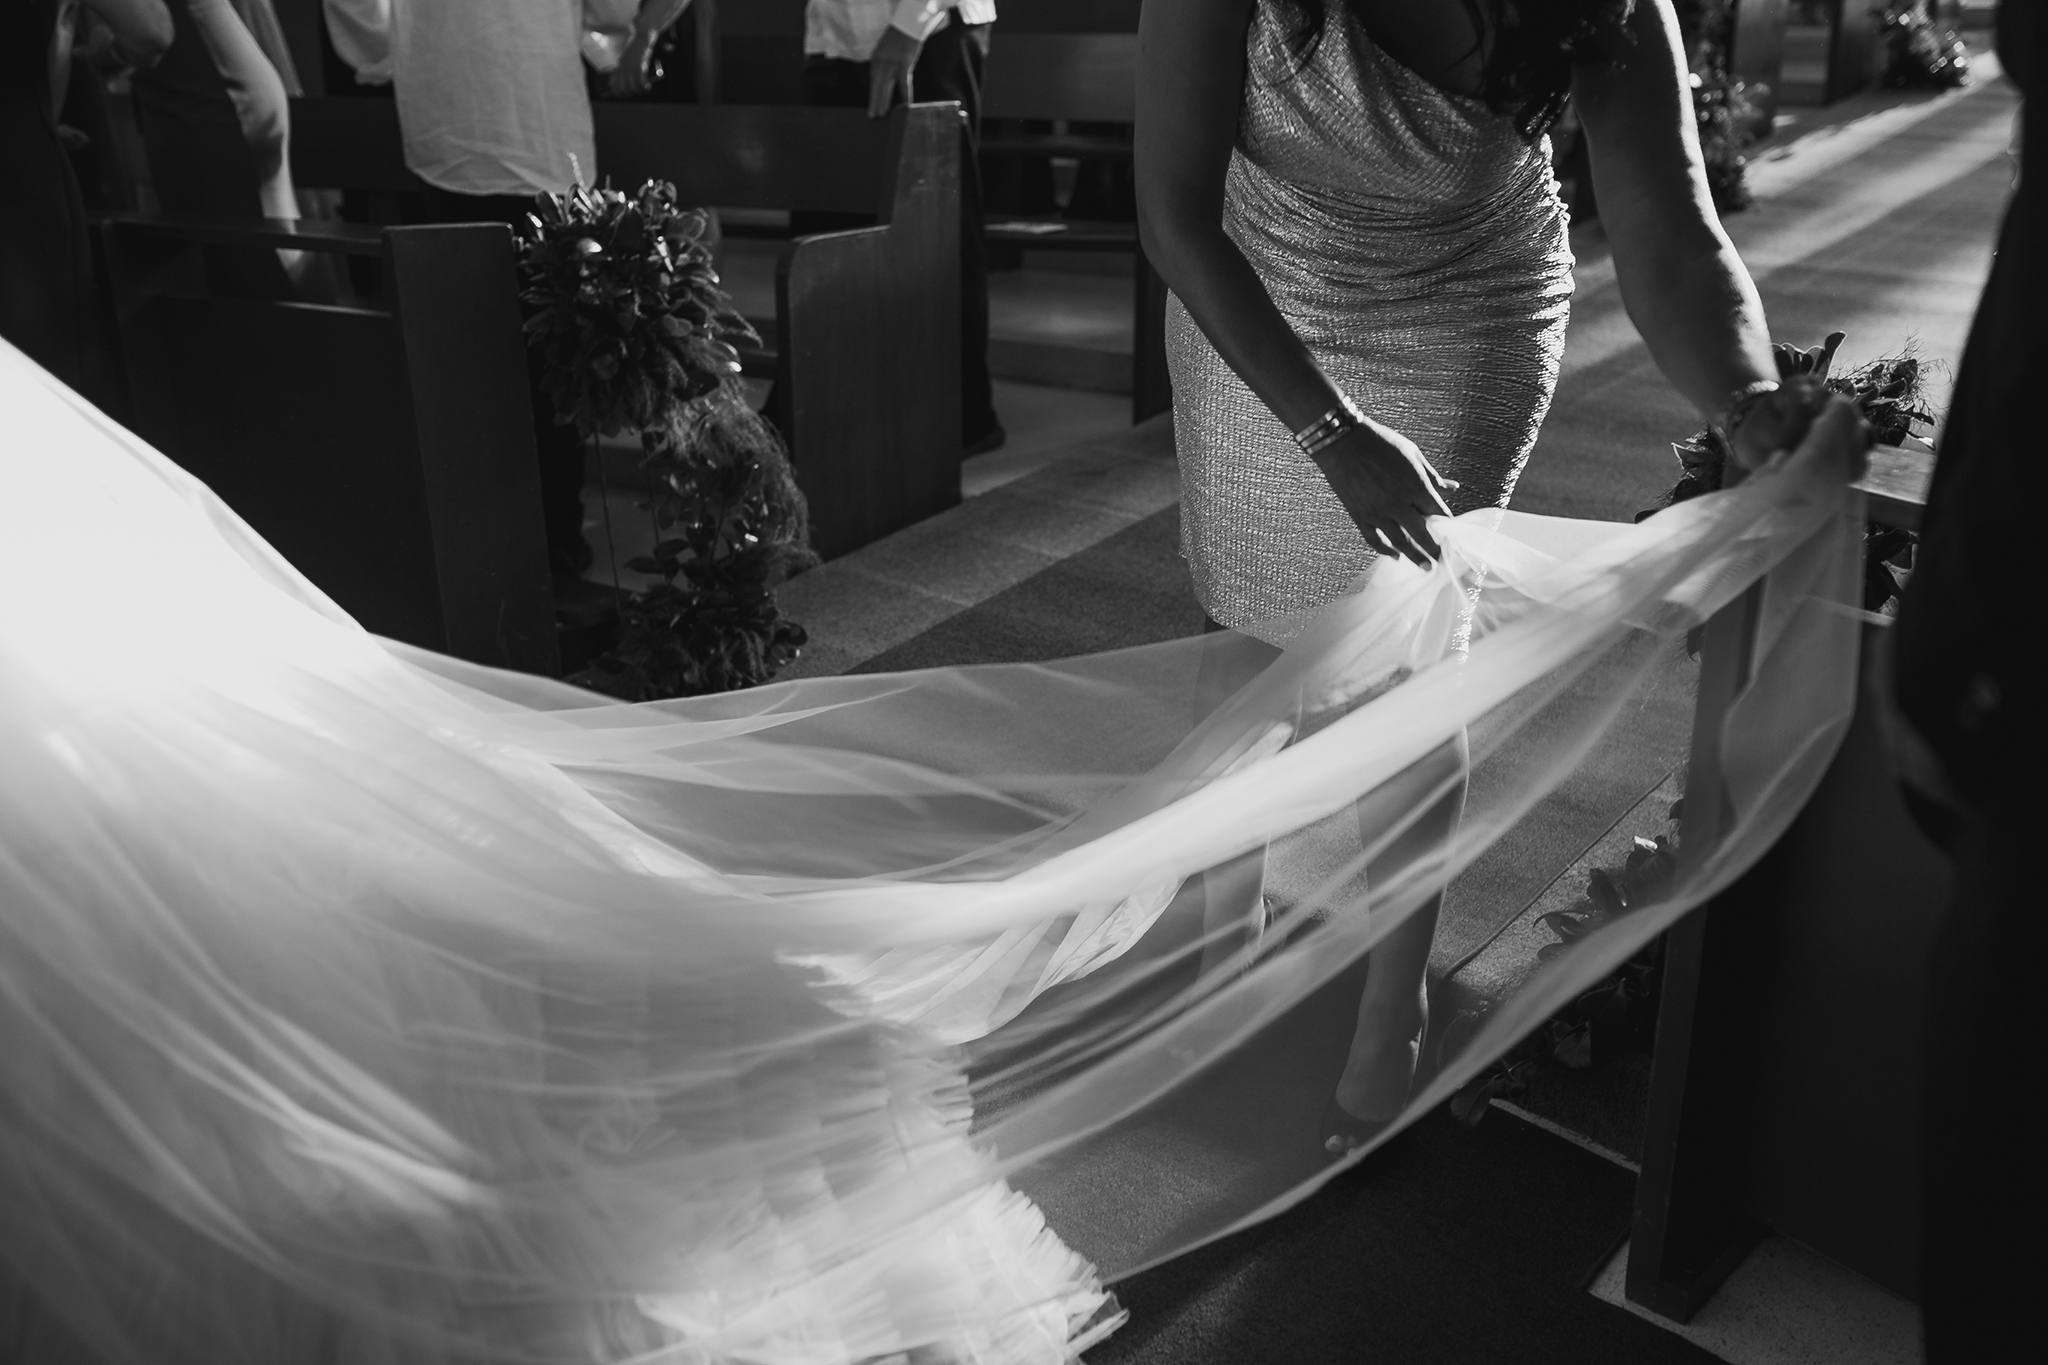 0727R&F__WeddingDestination_Weddingmerida_BodaMexico_FotografoDeBodas_FabrizioSimoneenFotografo.jpg